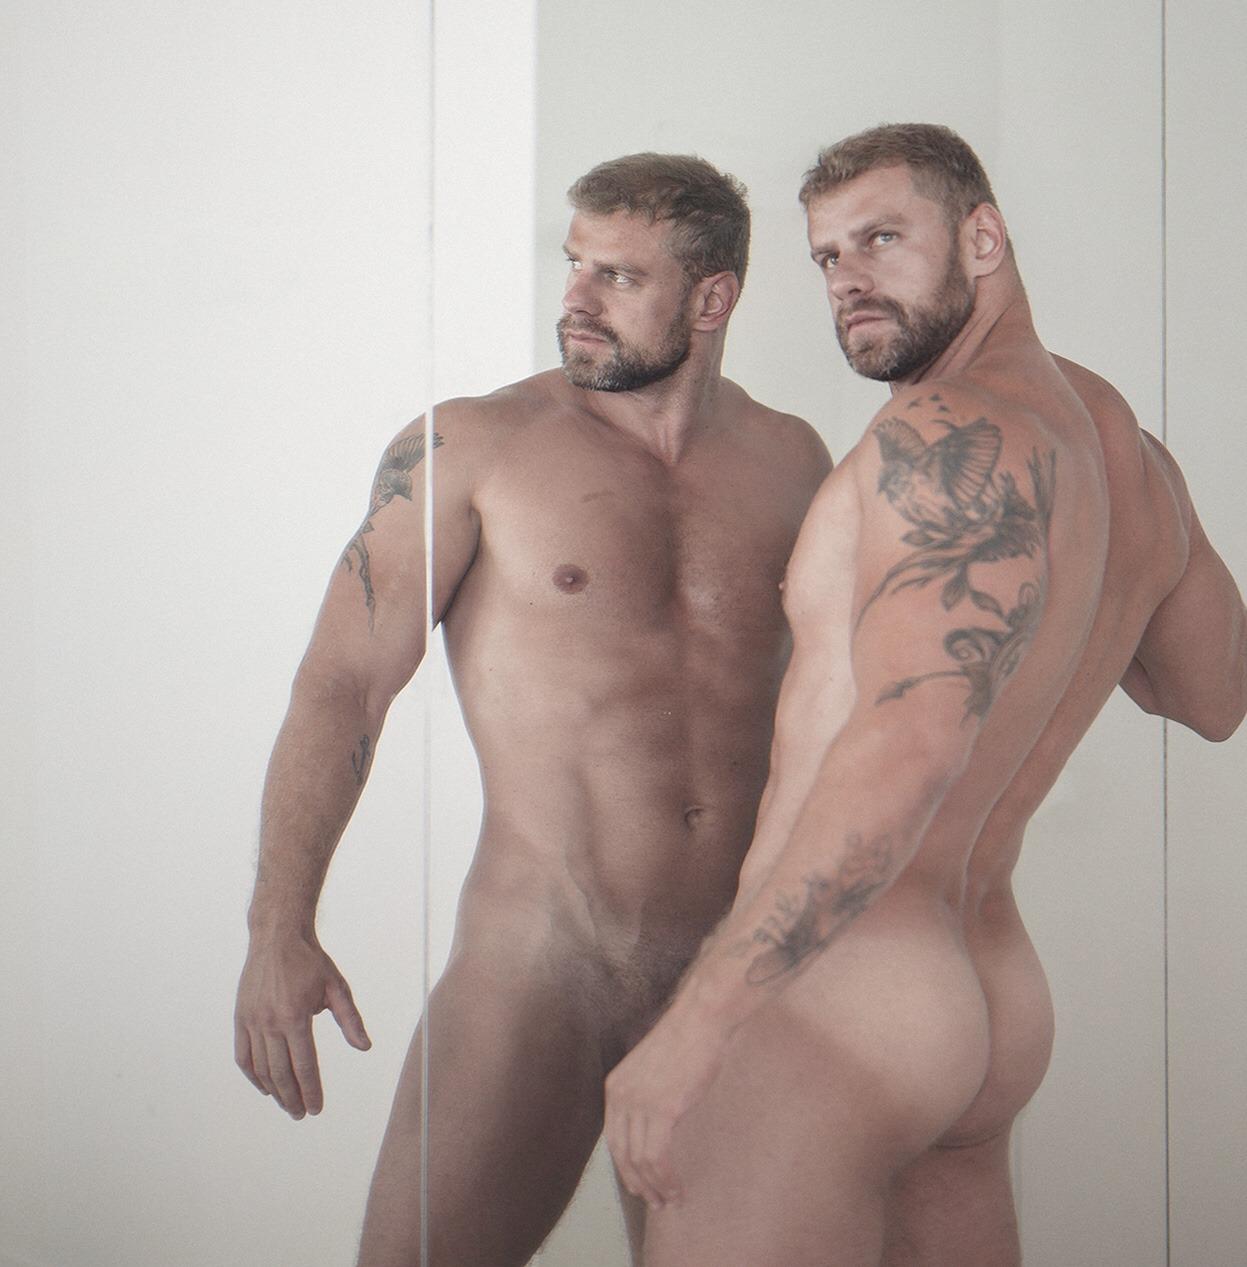 Andrew Sirkin gay hot daddy dude men porn